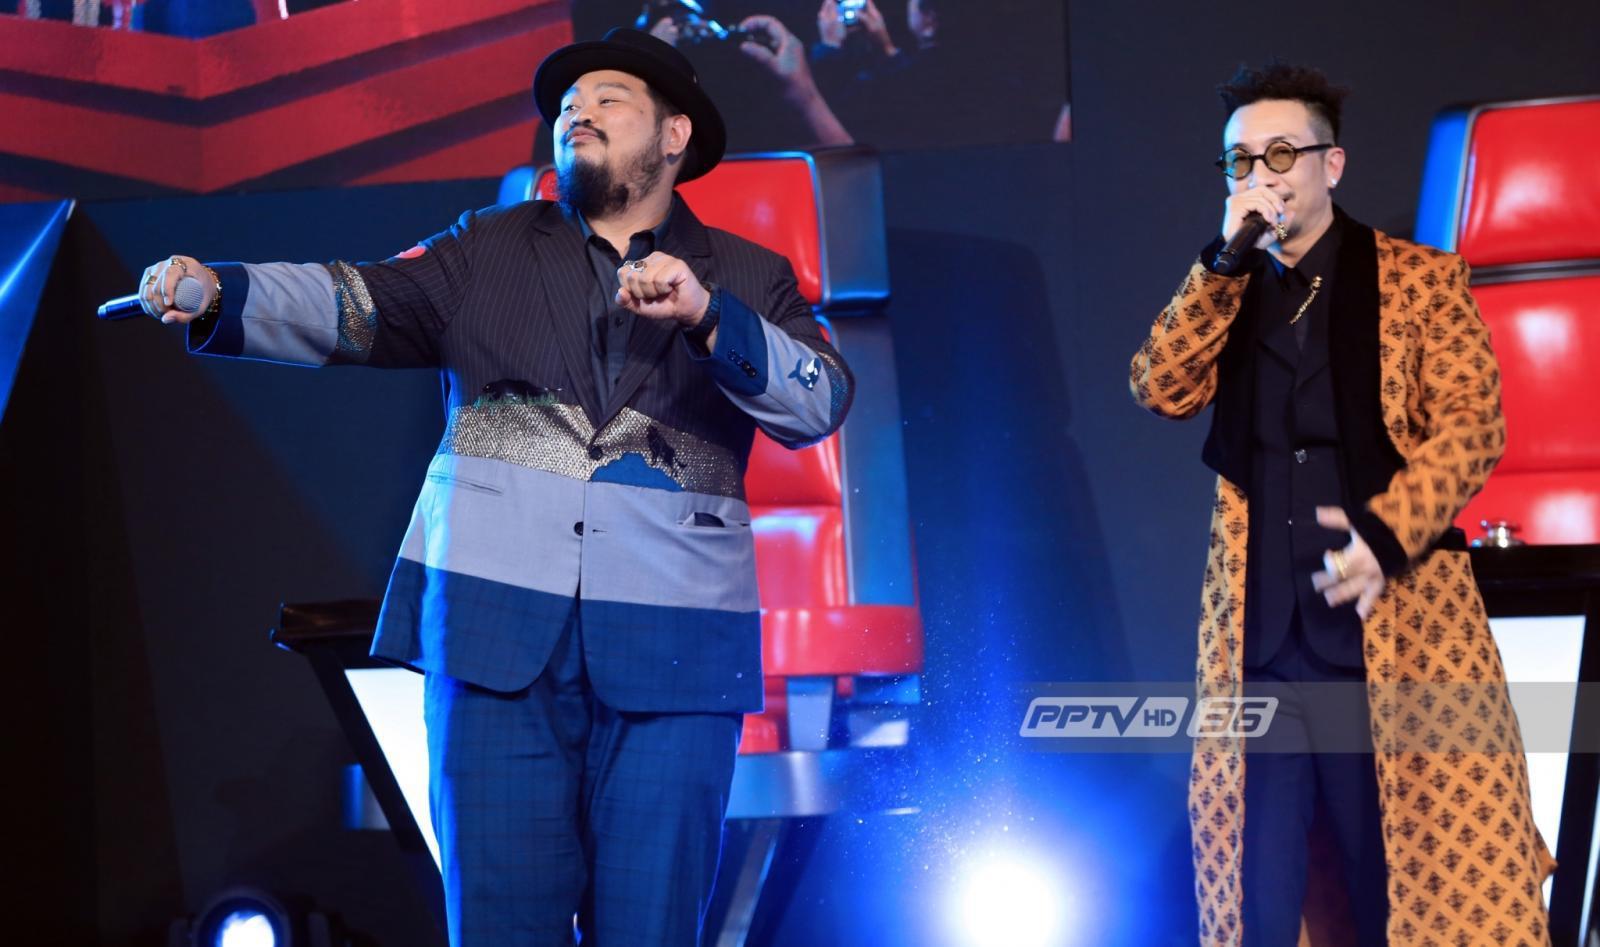 """The Voice 2018"" เปิดตัว 4โค้ช ลงผัง PPTVHD 36 เริ่ม 19 พ.ย.61"